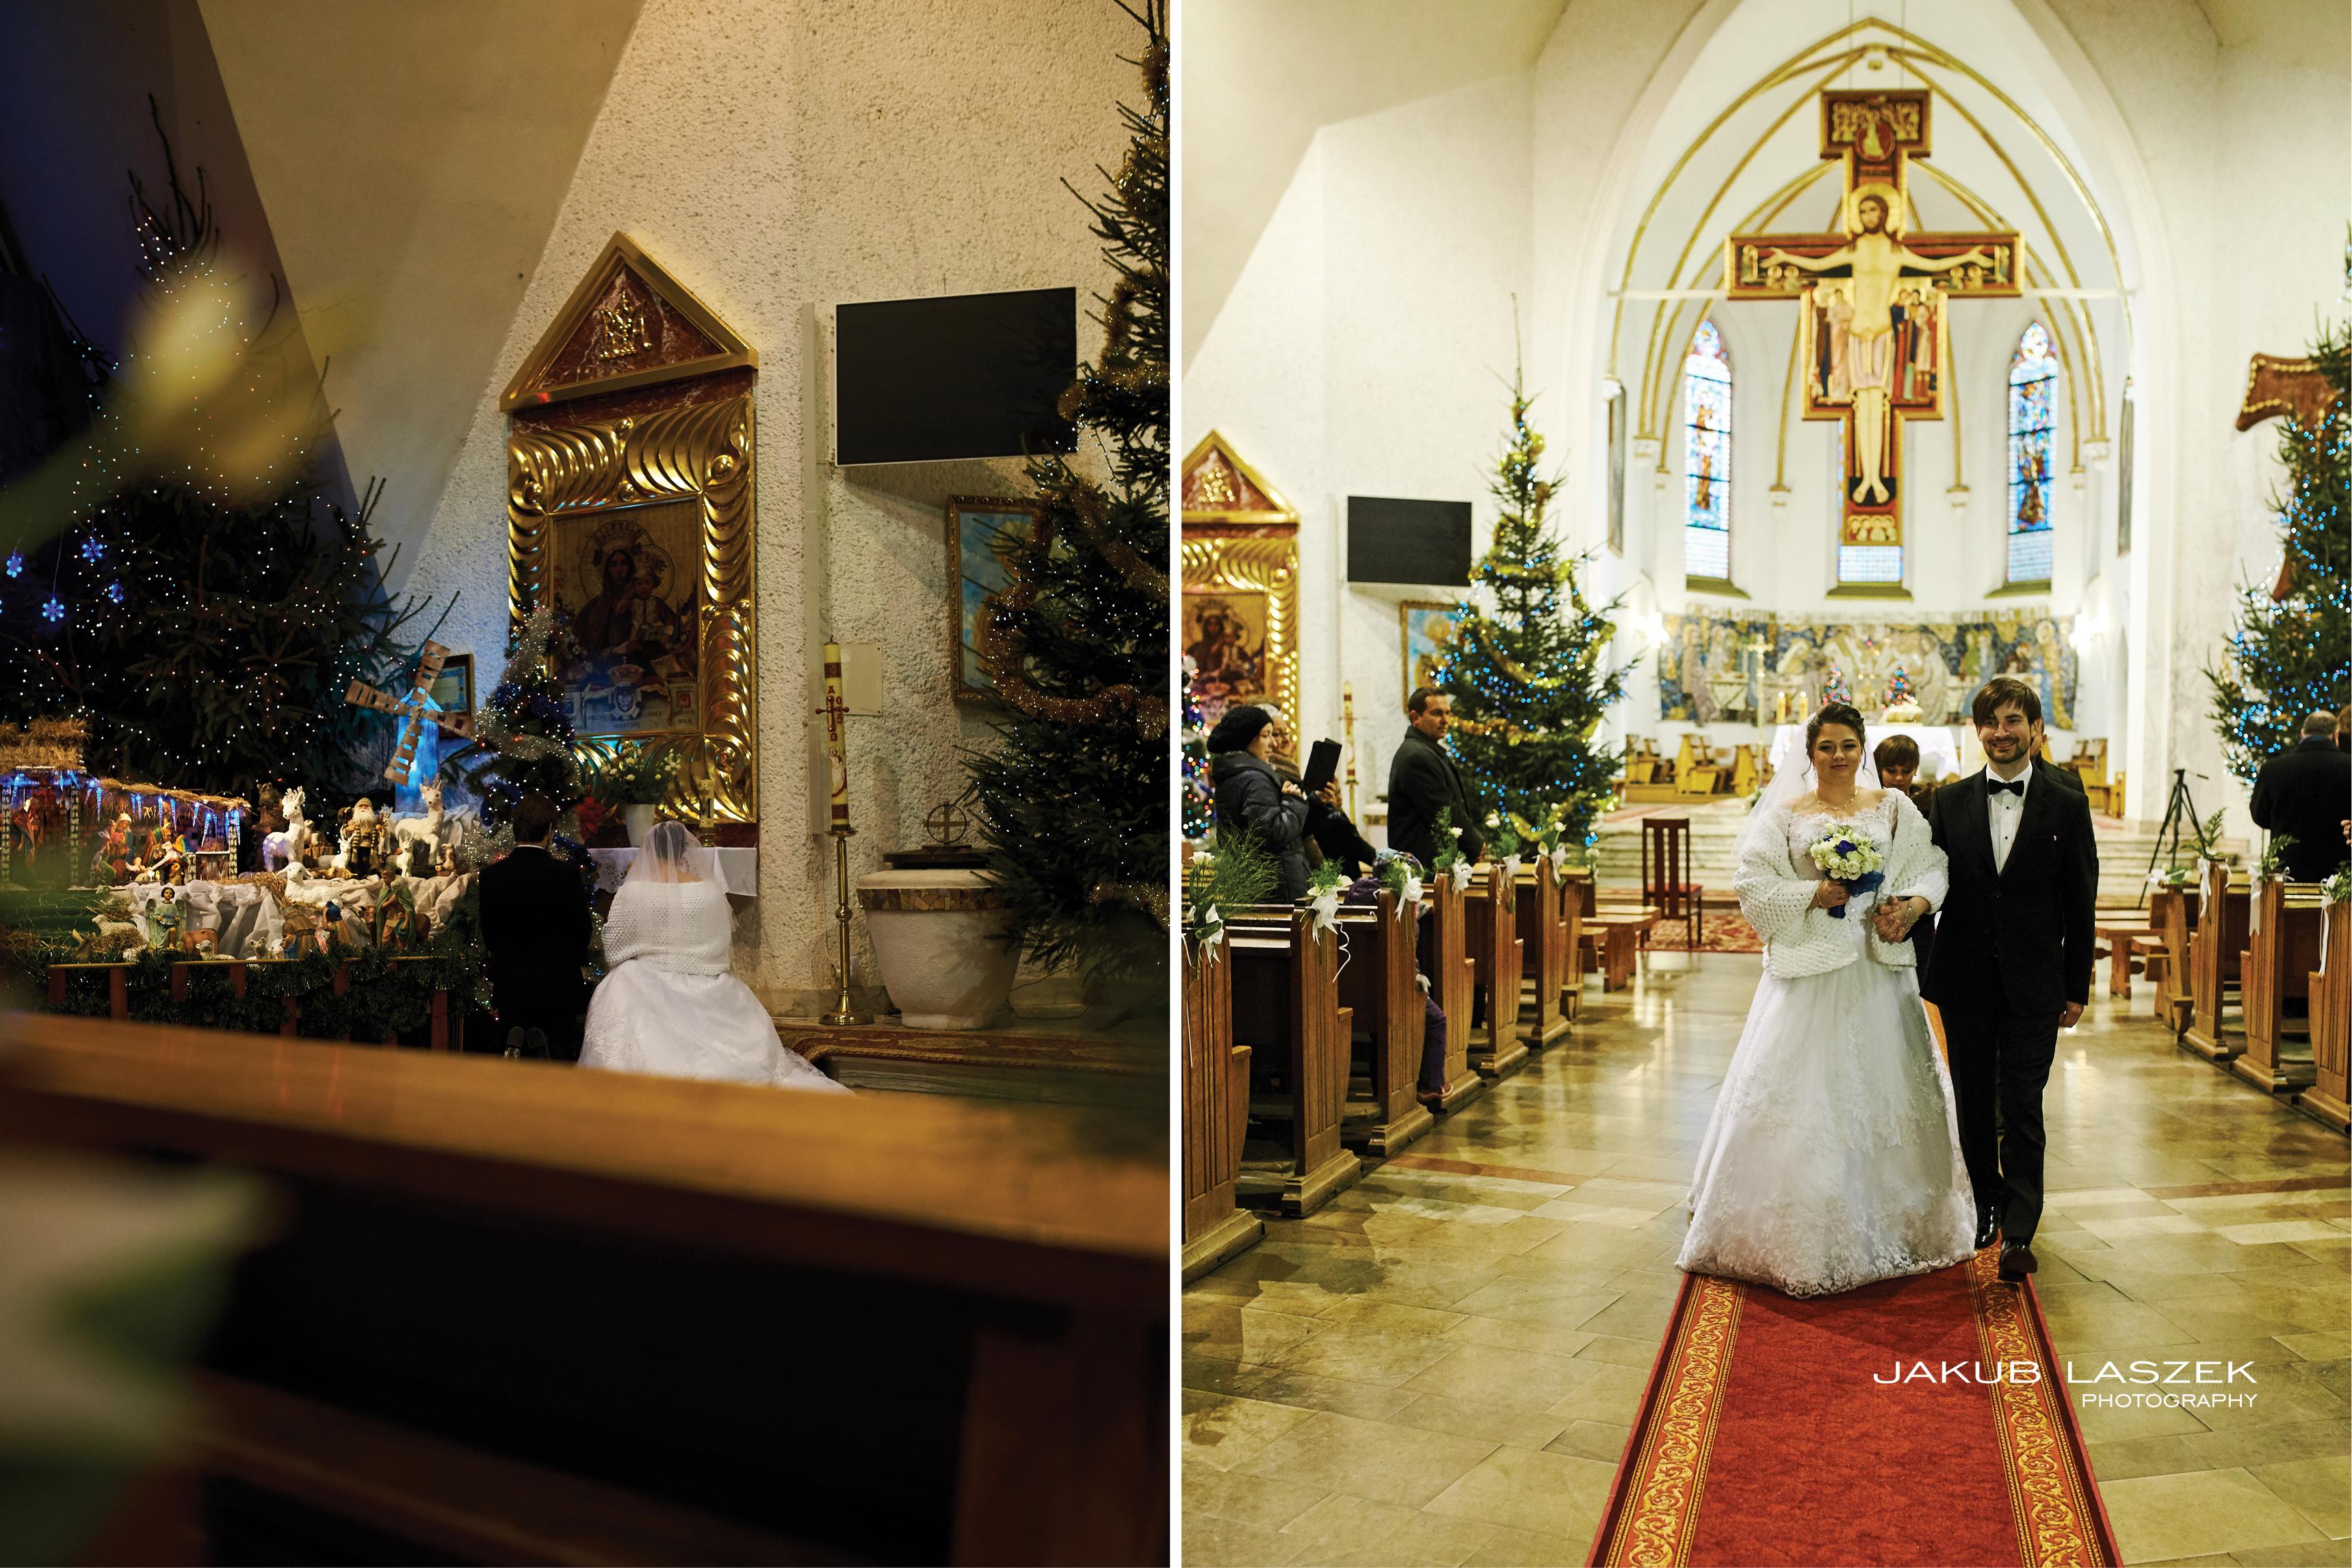 tarnow_fotograf_slubny_wedding_photographer19